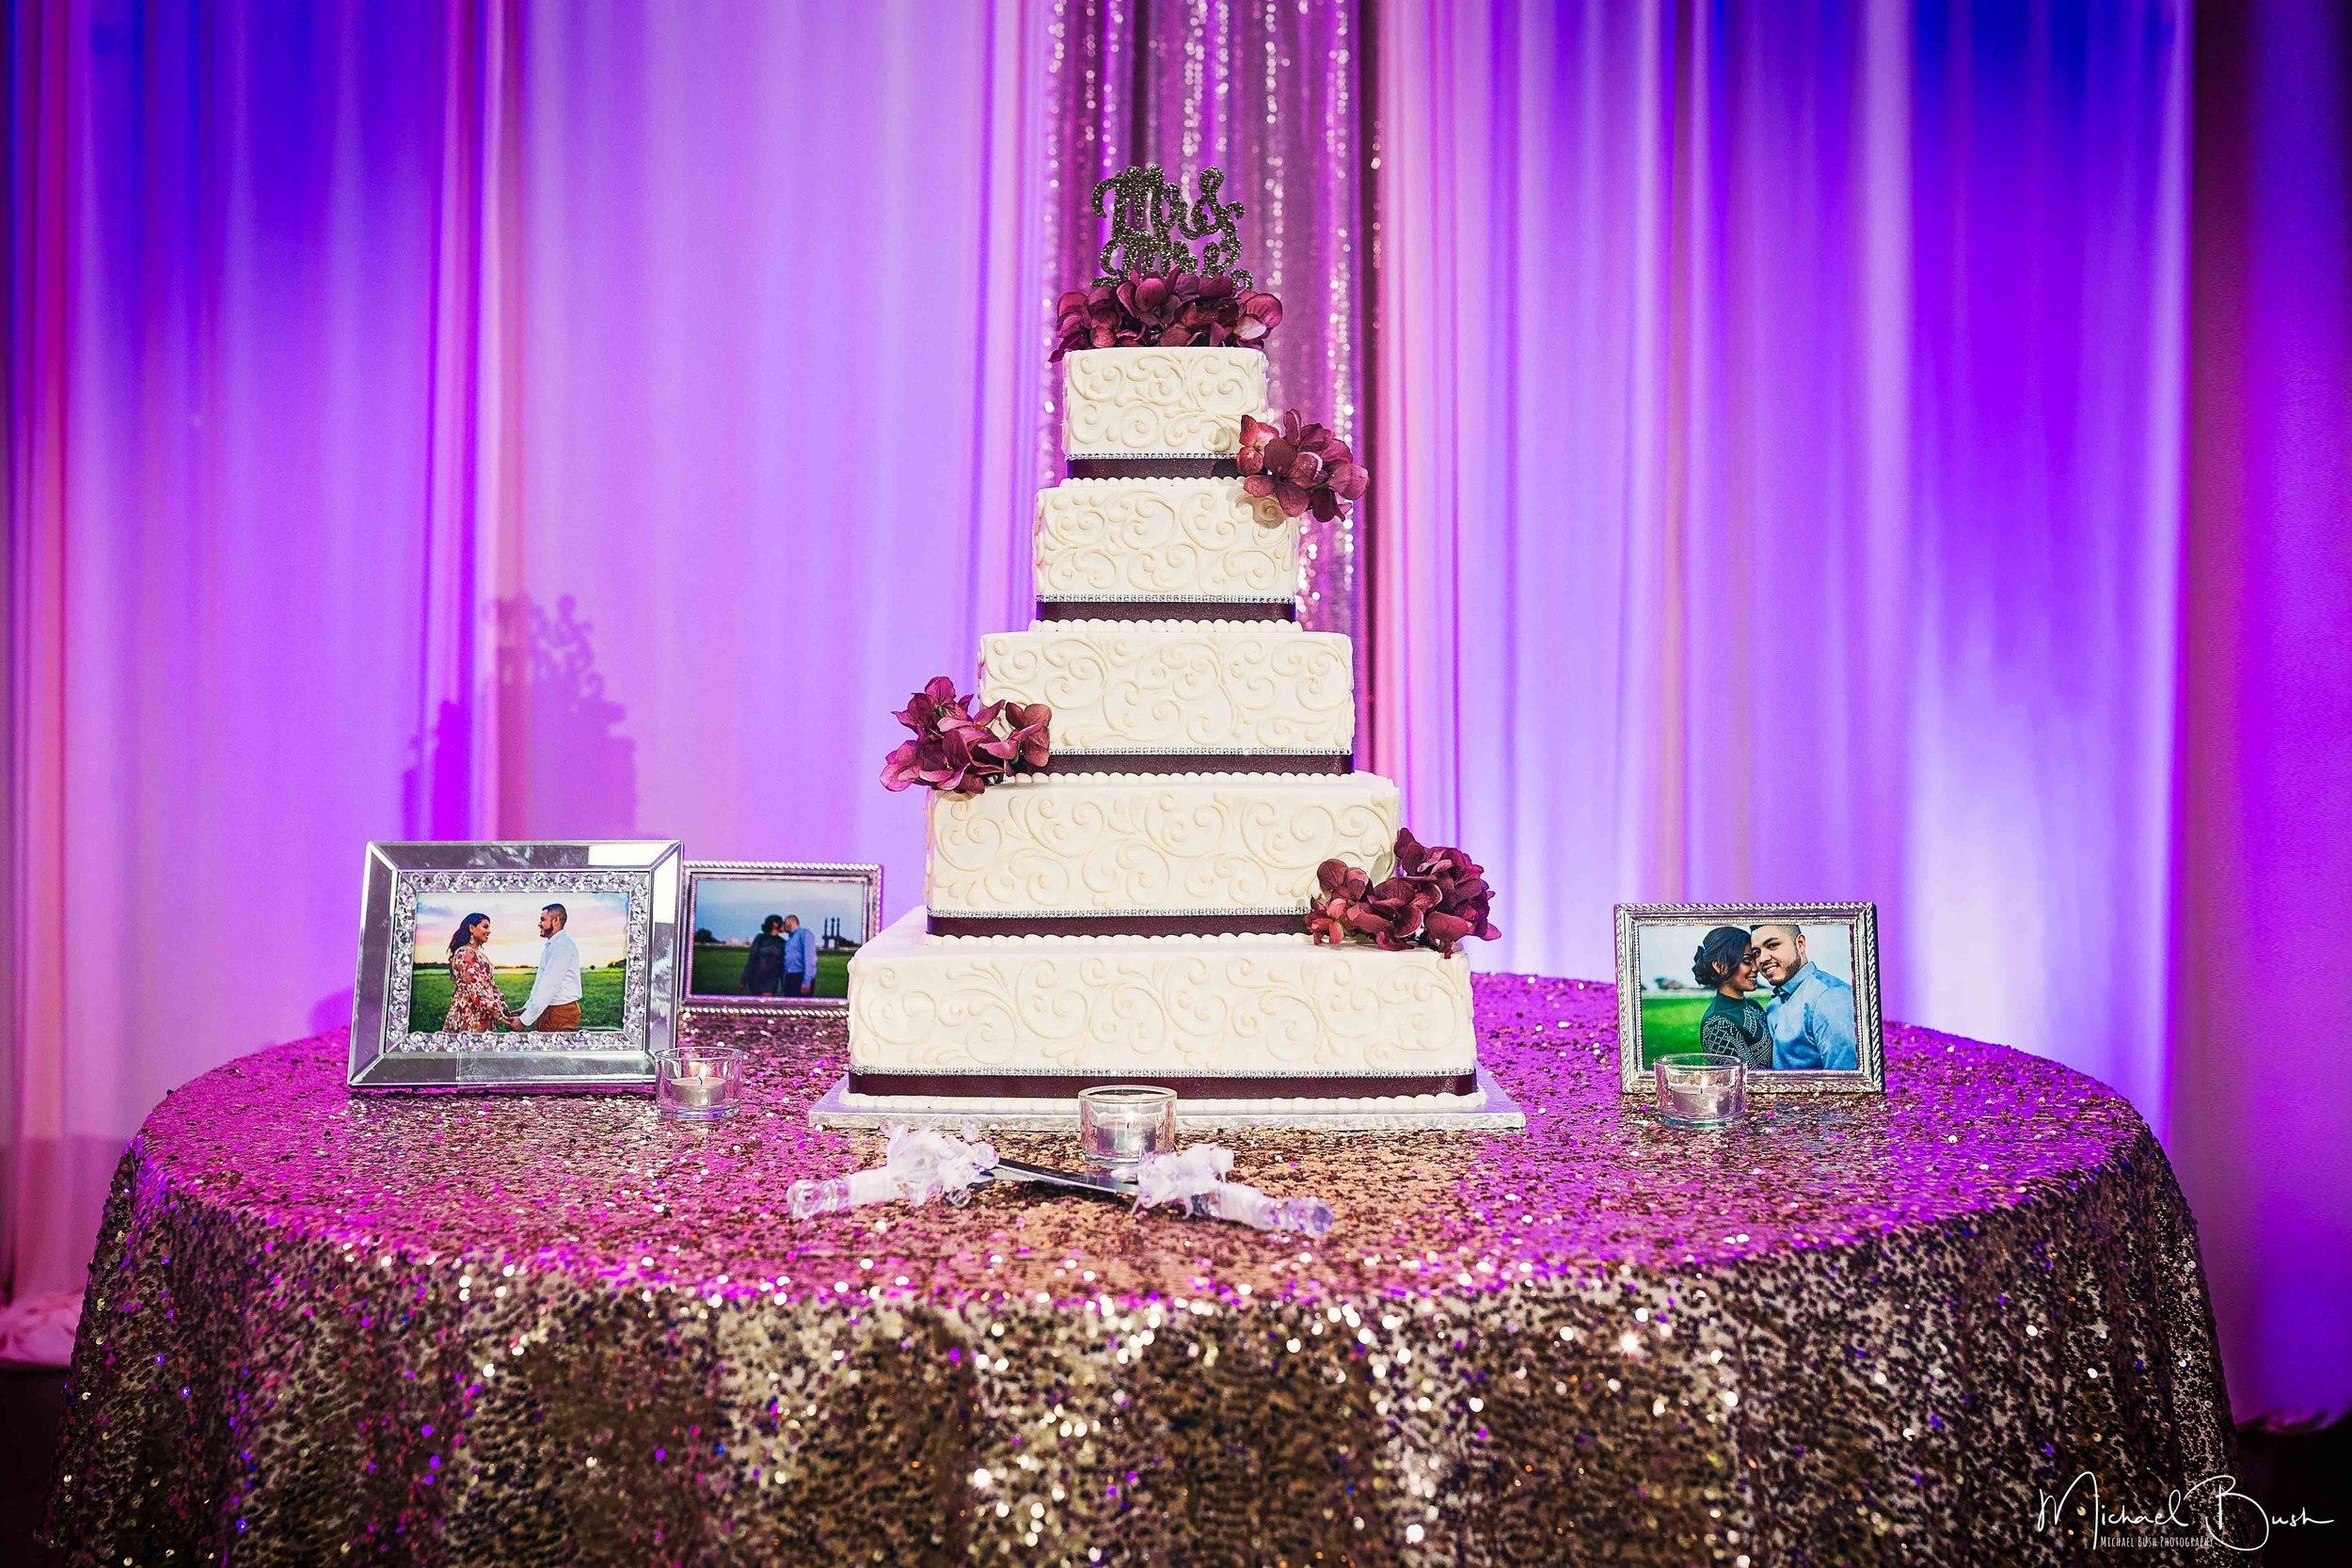 Wedding-Reception-Detials-Fort-Worth-Venue-wedding-cake-cakes.jpg